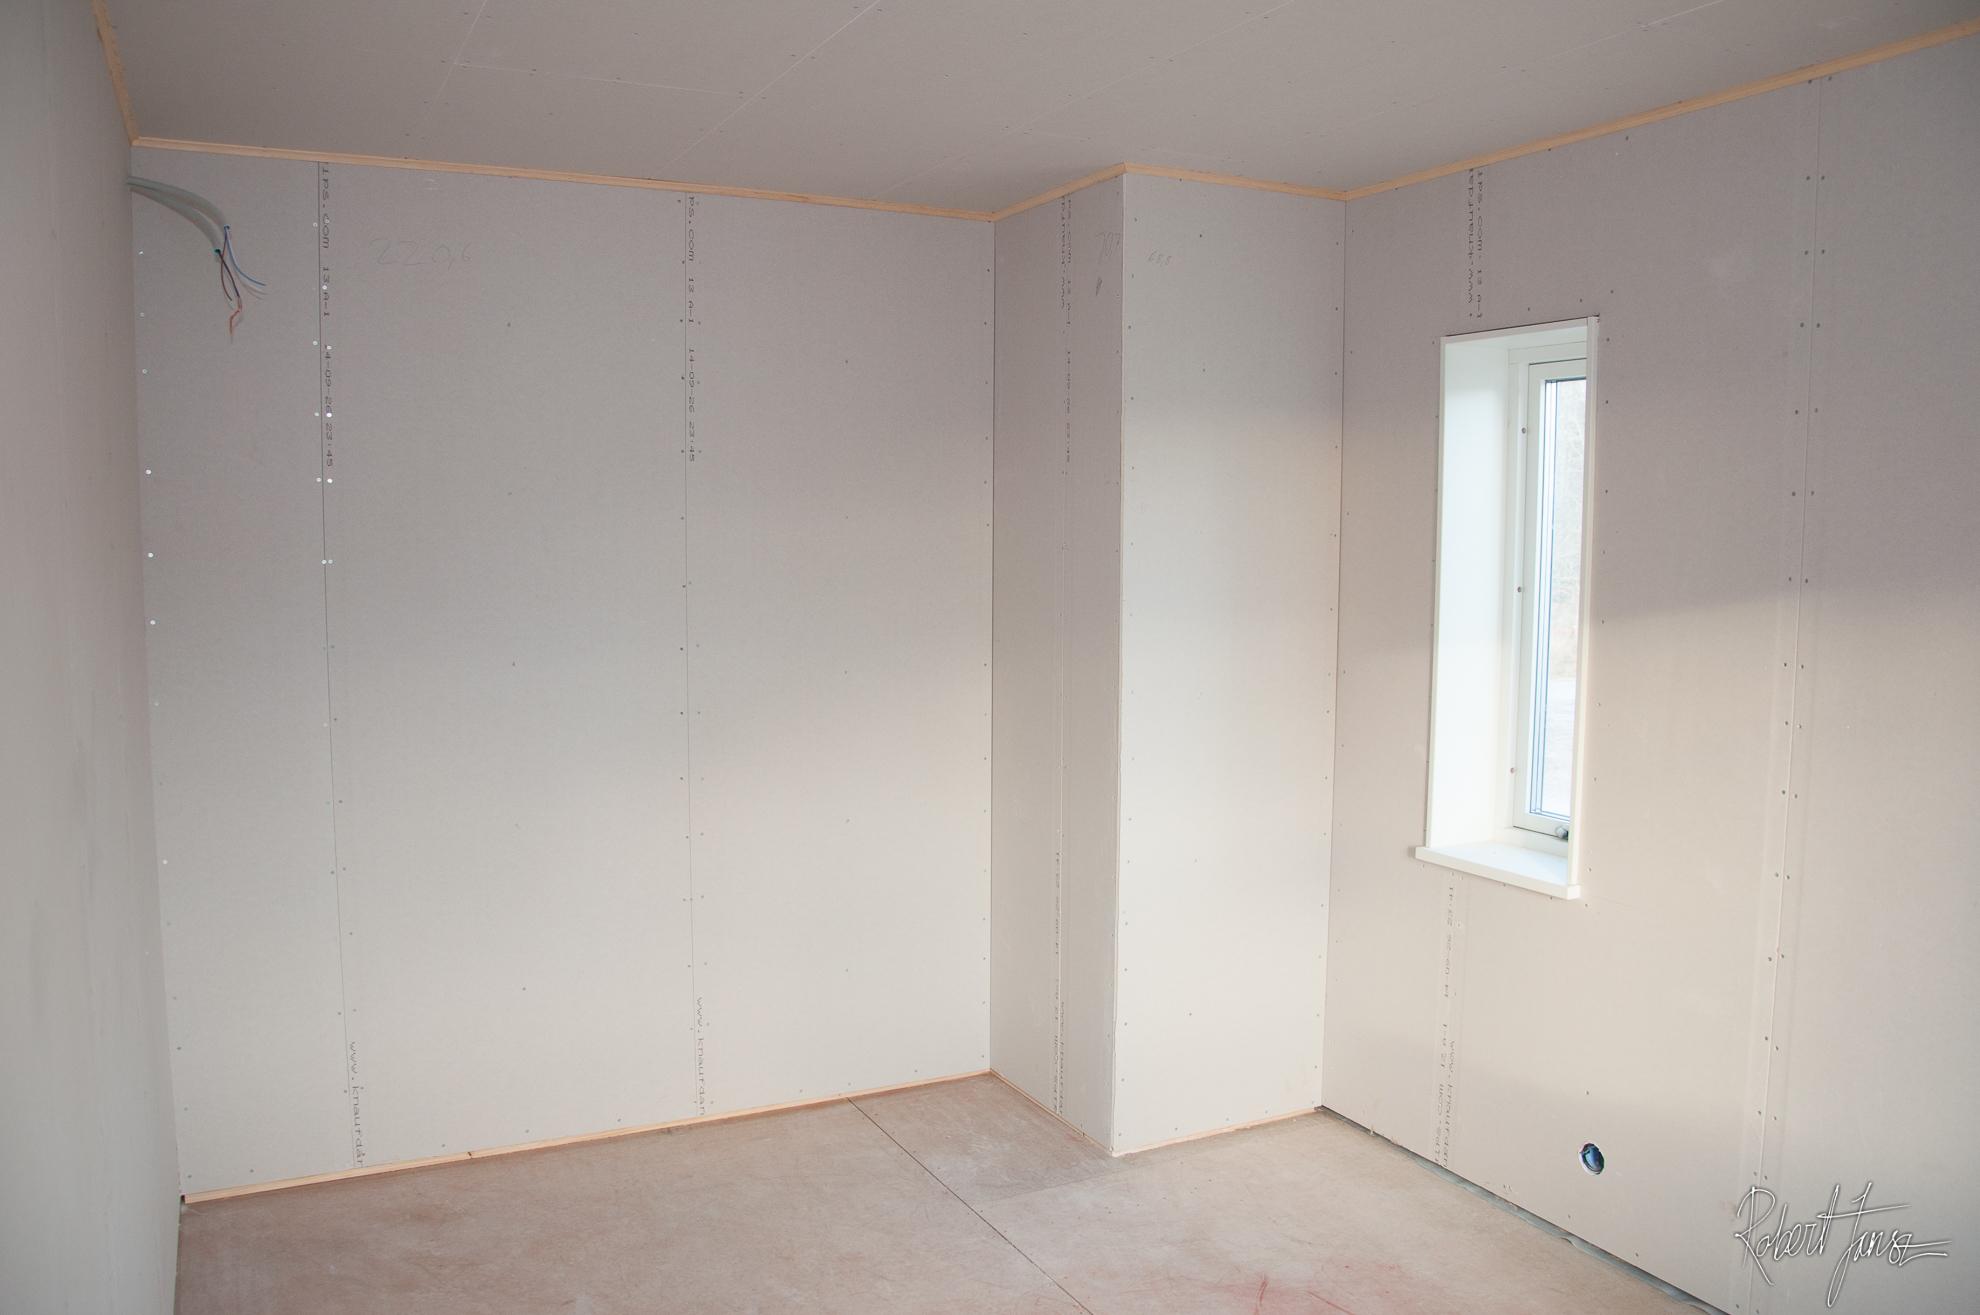 Master bedroom - drywalled